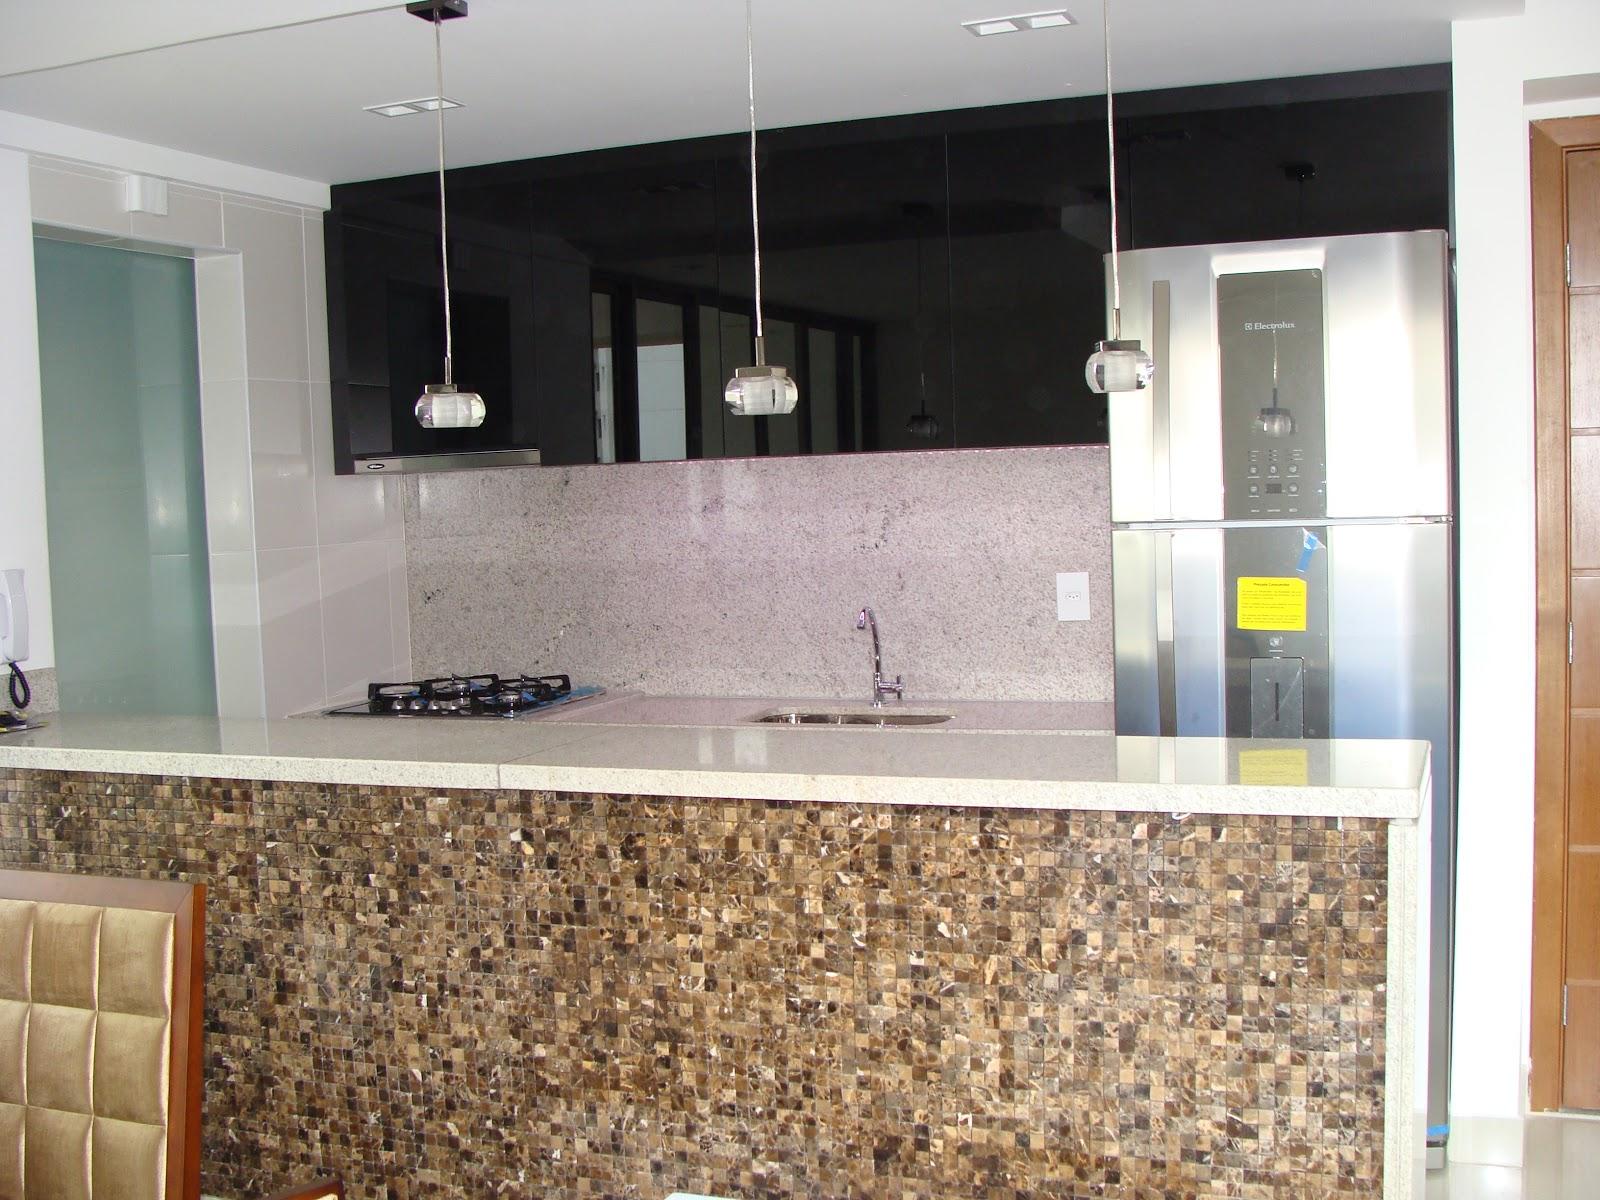 #91653A MARCENARIA PROJETO S/A: COZINHA AMERICANA 1600x1200 px Projeto Cozinha Americana Com Sala De Jantar_4078 Imagens